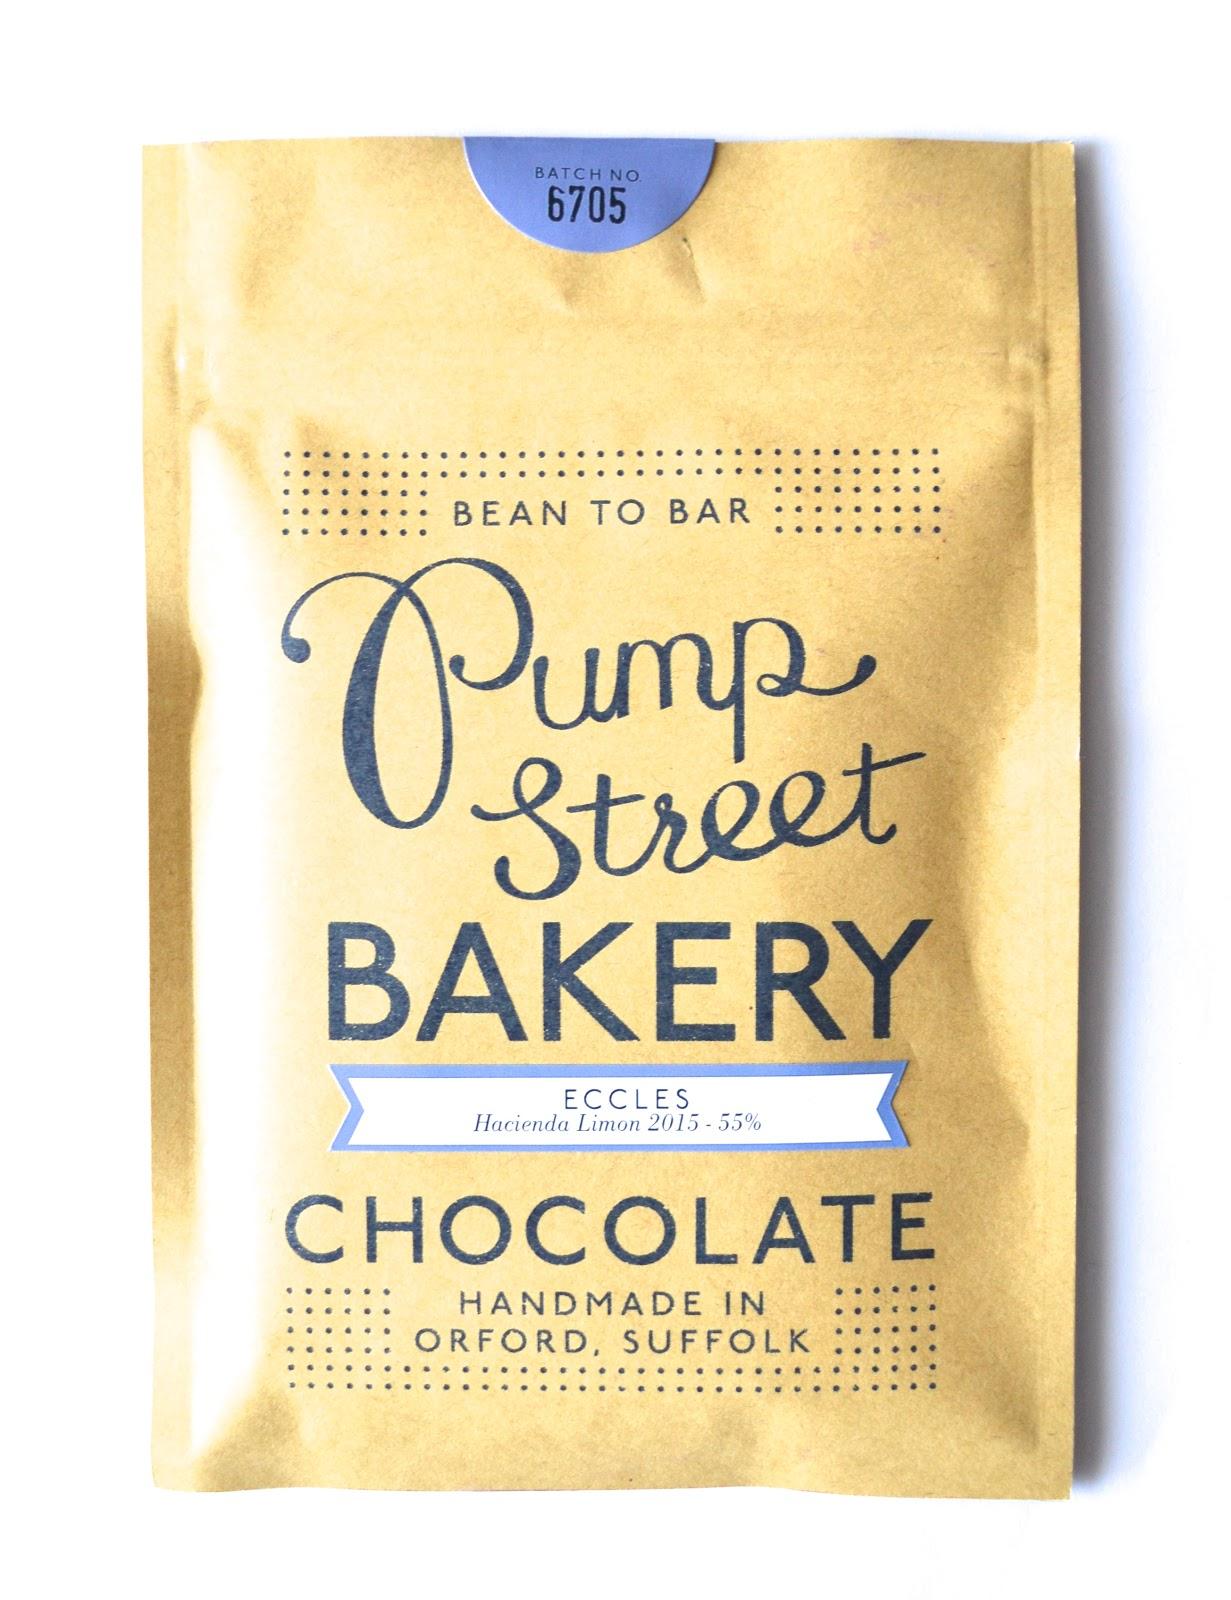 Chocolat Indulgence Pump Street Bakery Eccles